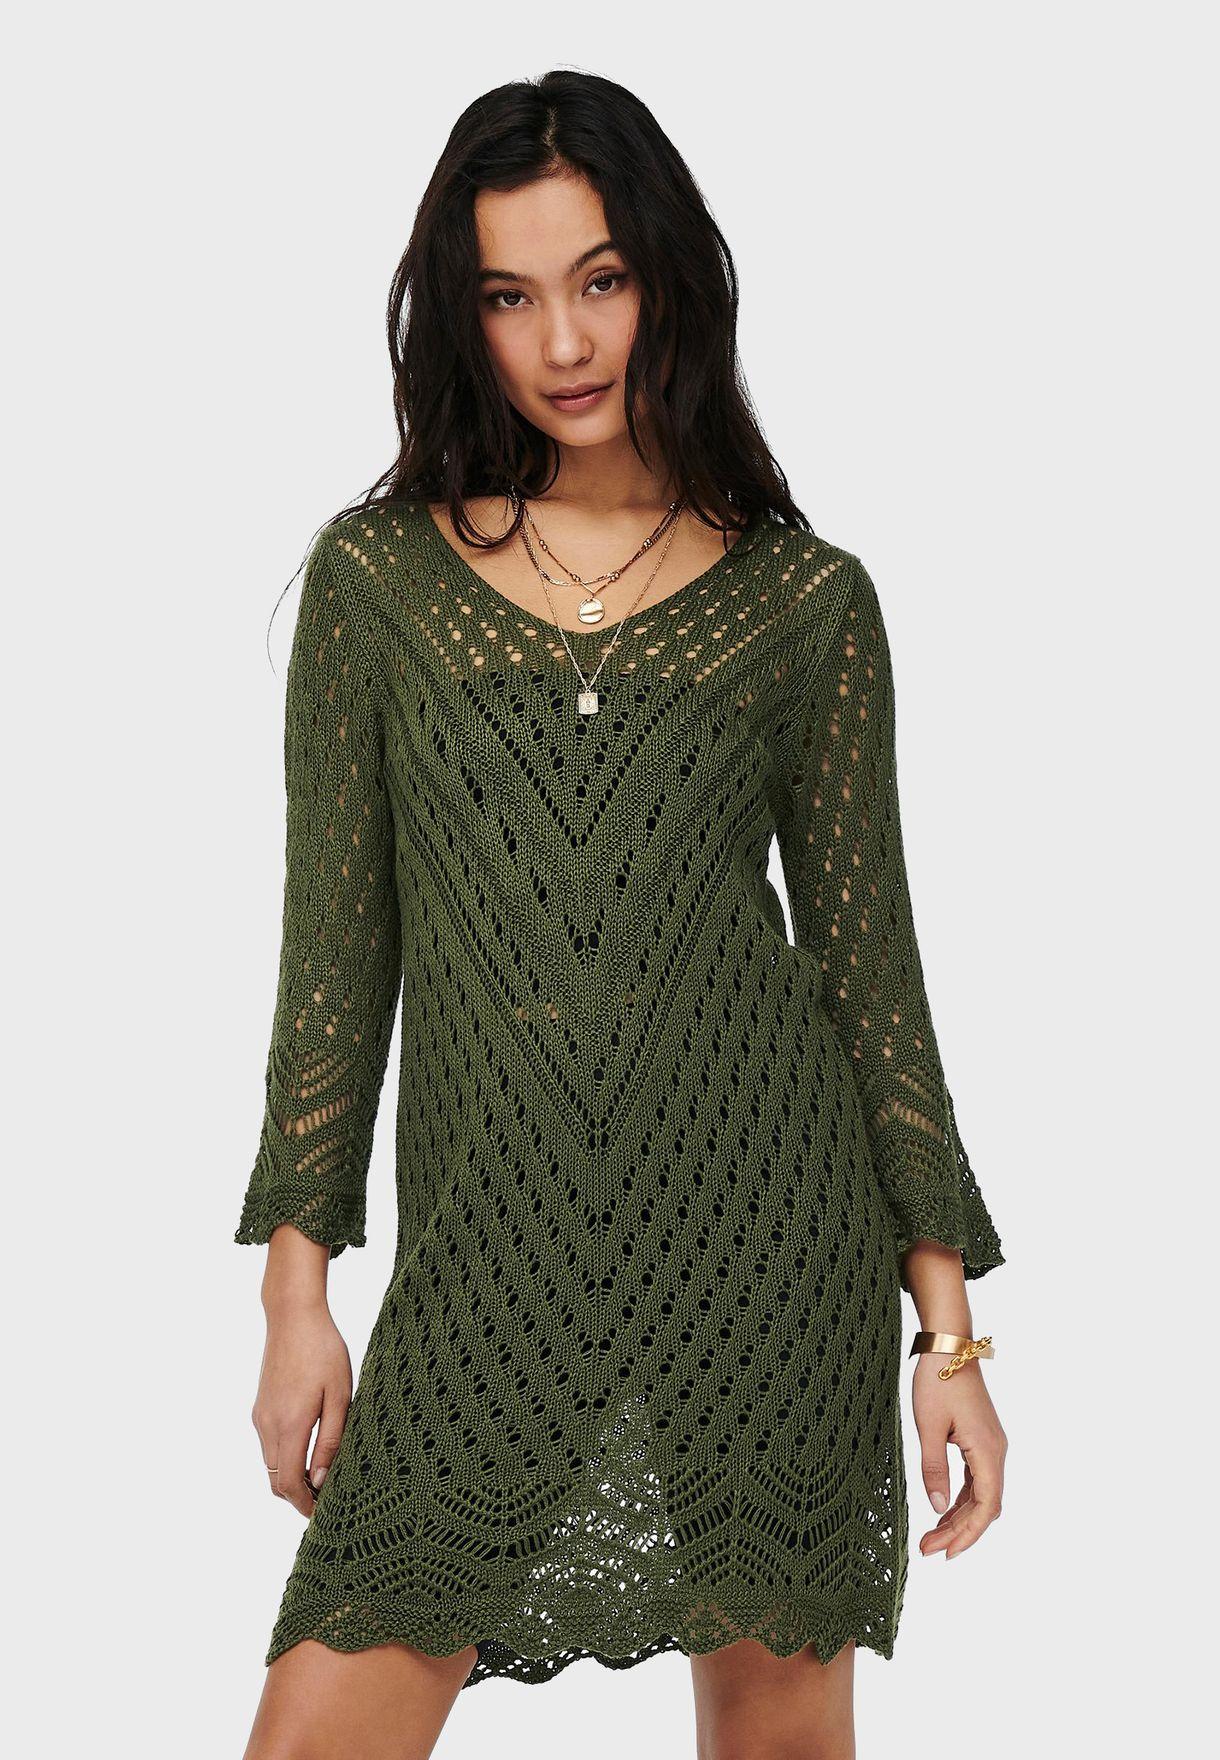 Mesh Knitted Dress